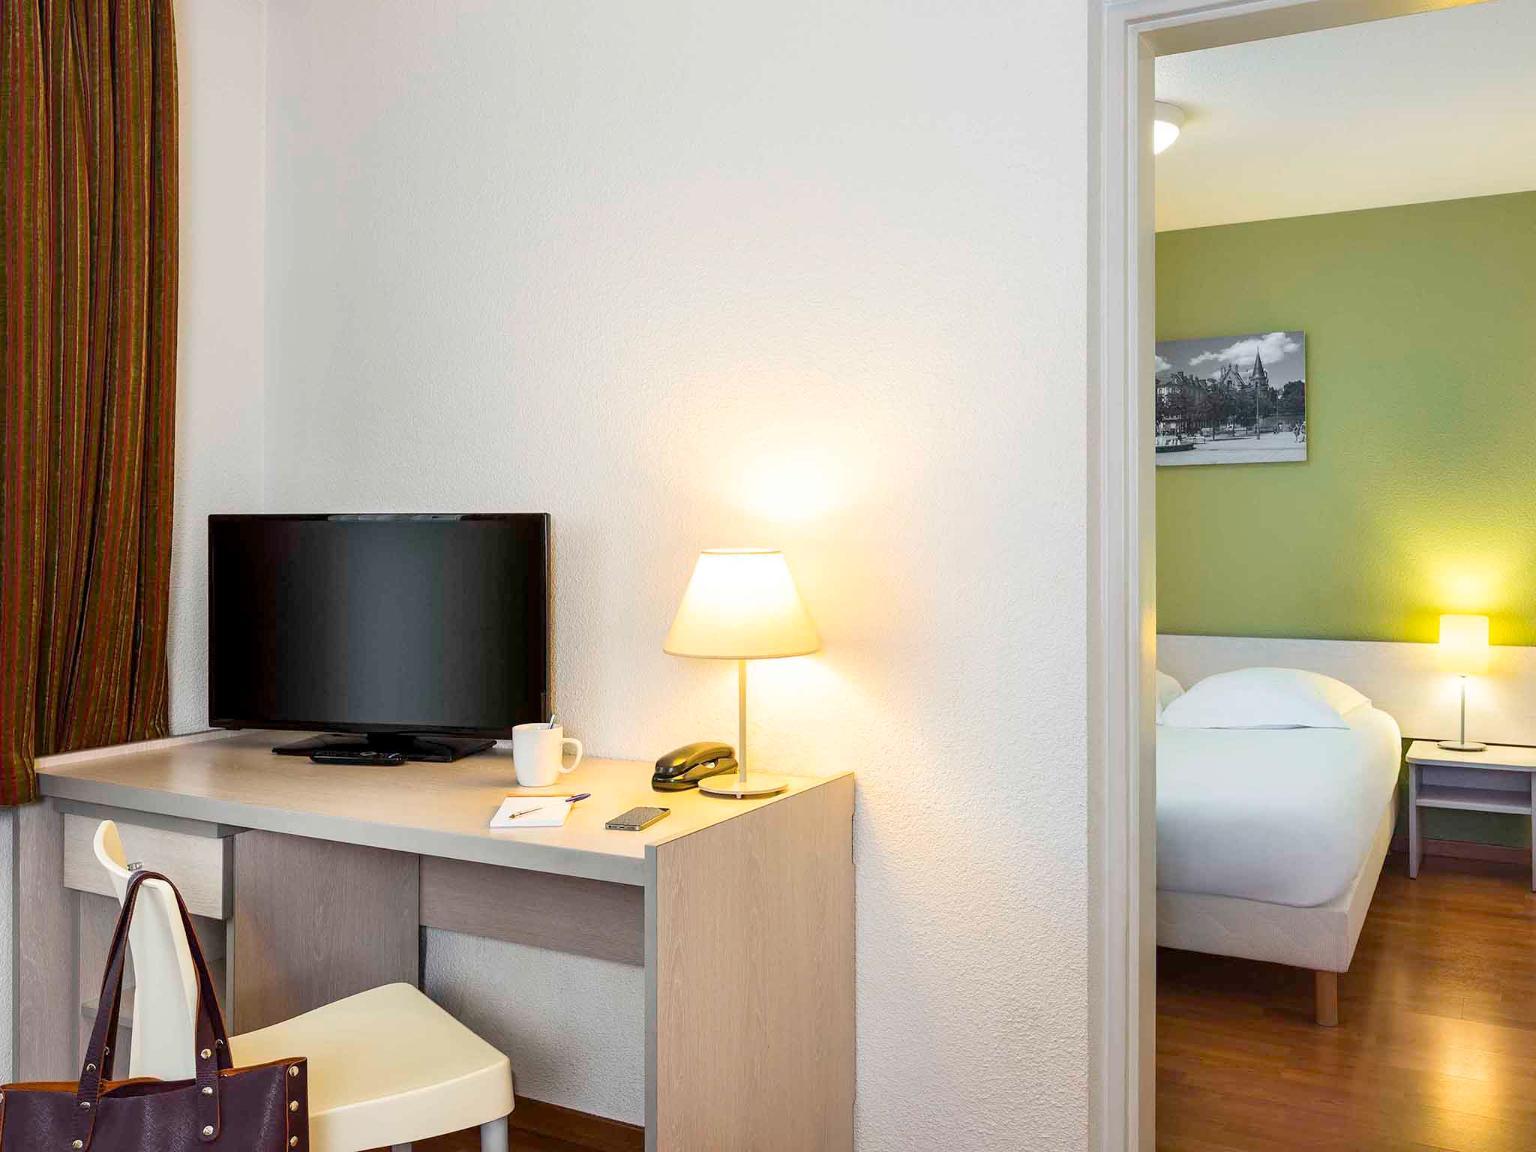 Aparthotel adagio access rennes centre h tel 35 rue d for Apparthotel 35